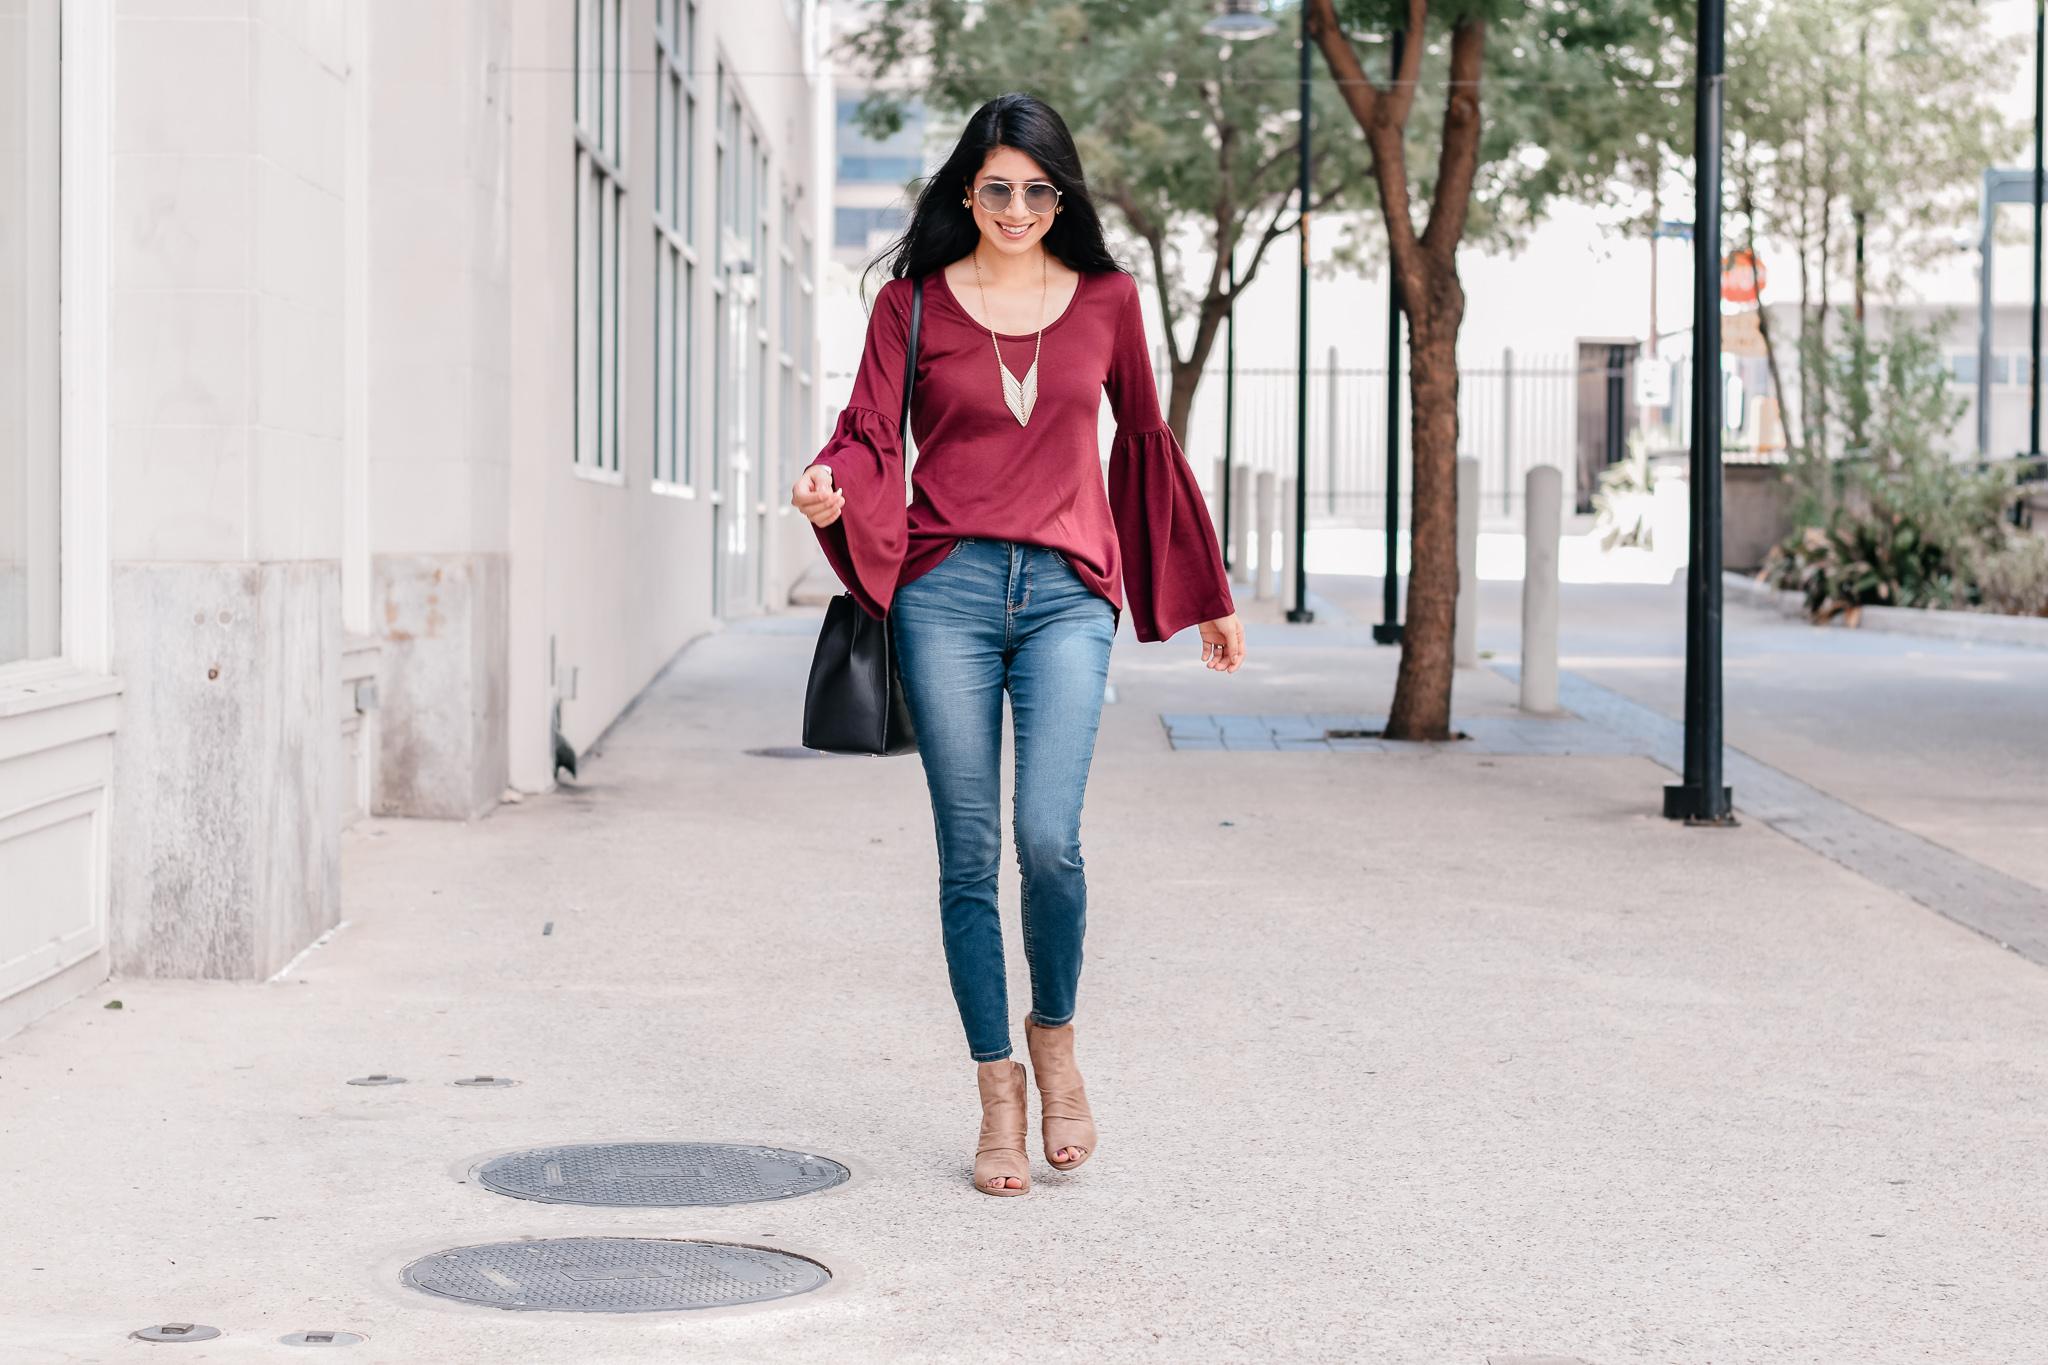 Hannah Lantern Knit Top /Vanilla Star Skinny Jeans /Yoki Katty Ankle Boots /Nine West Maddol Tote Bag